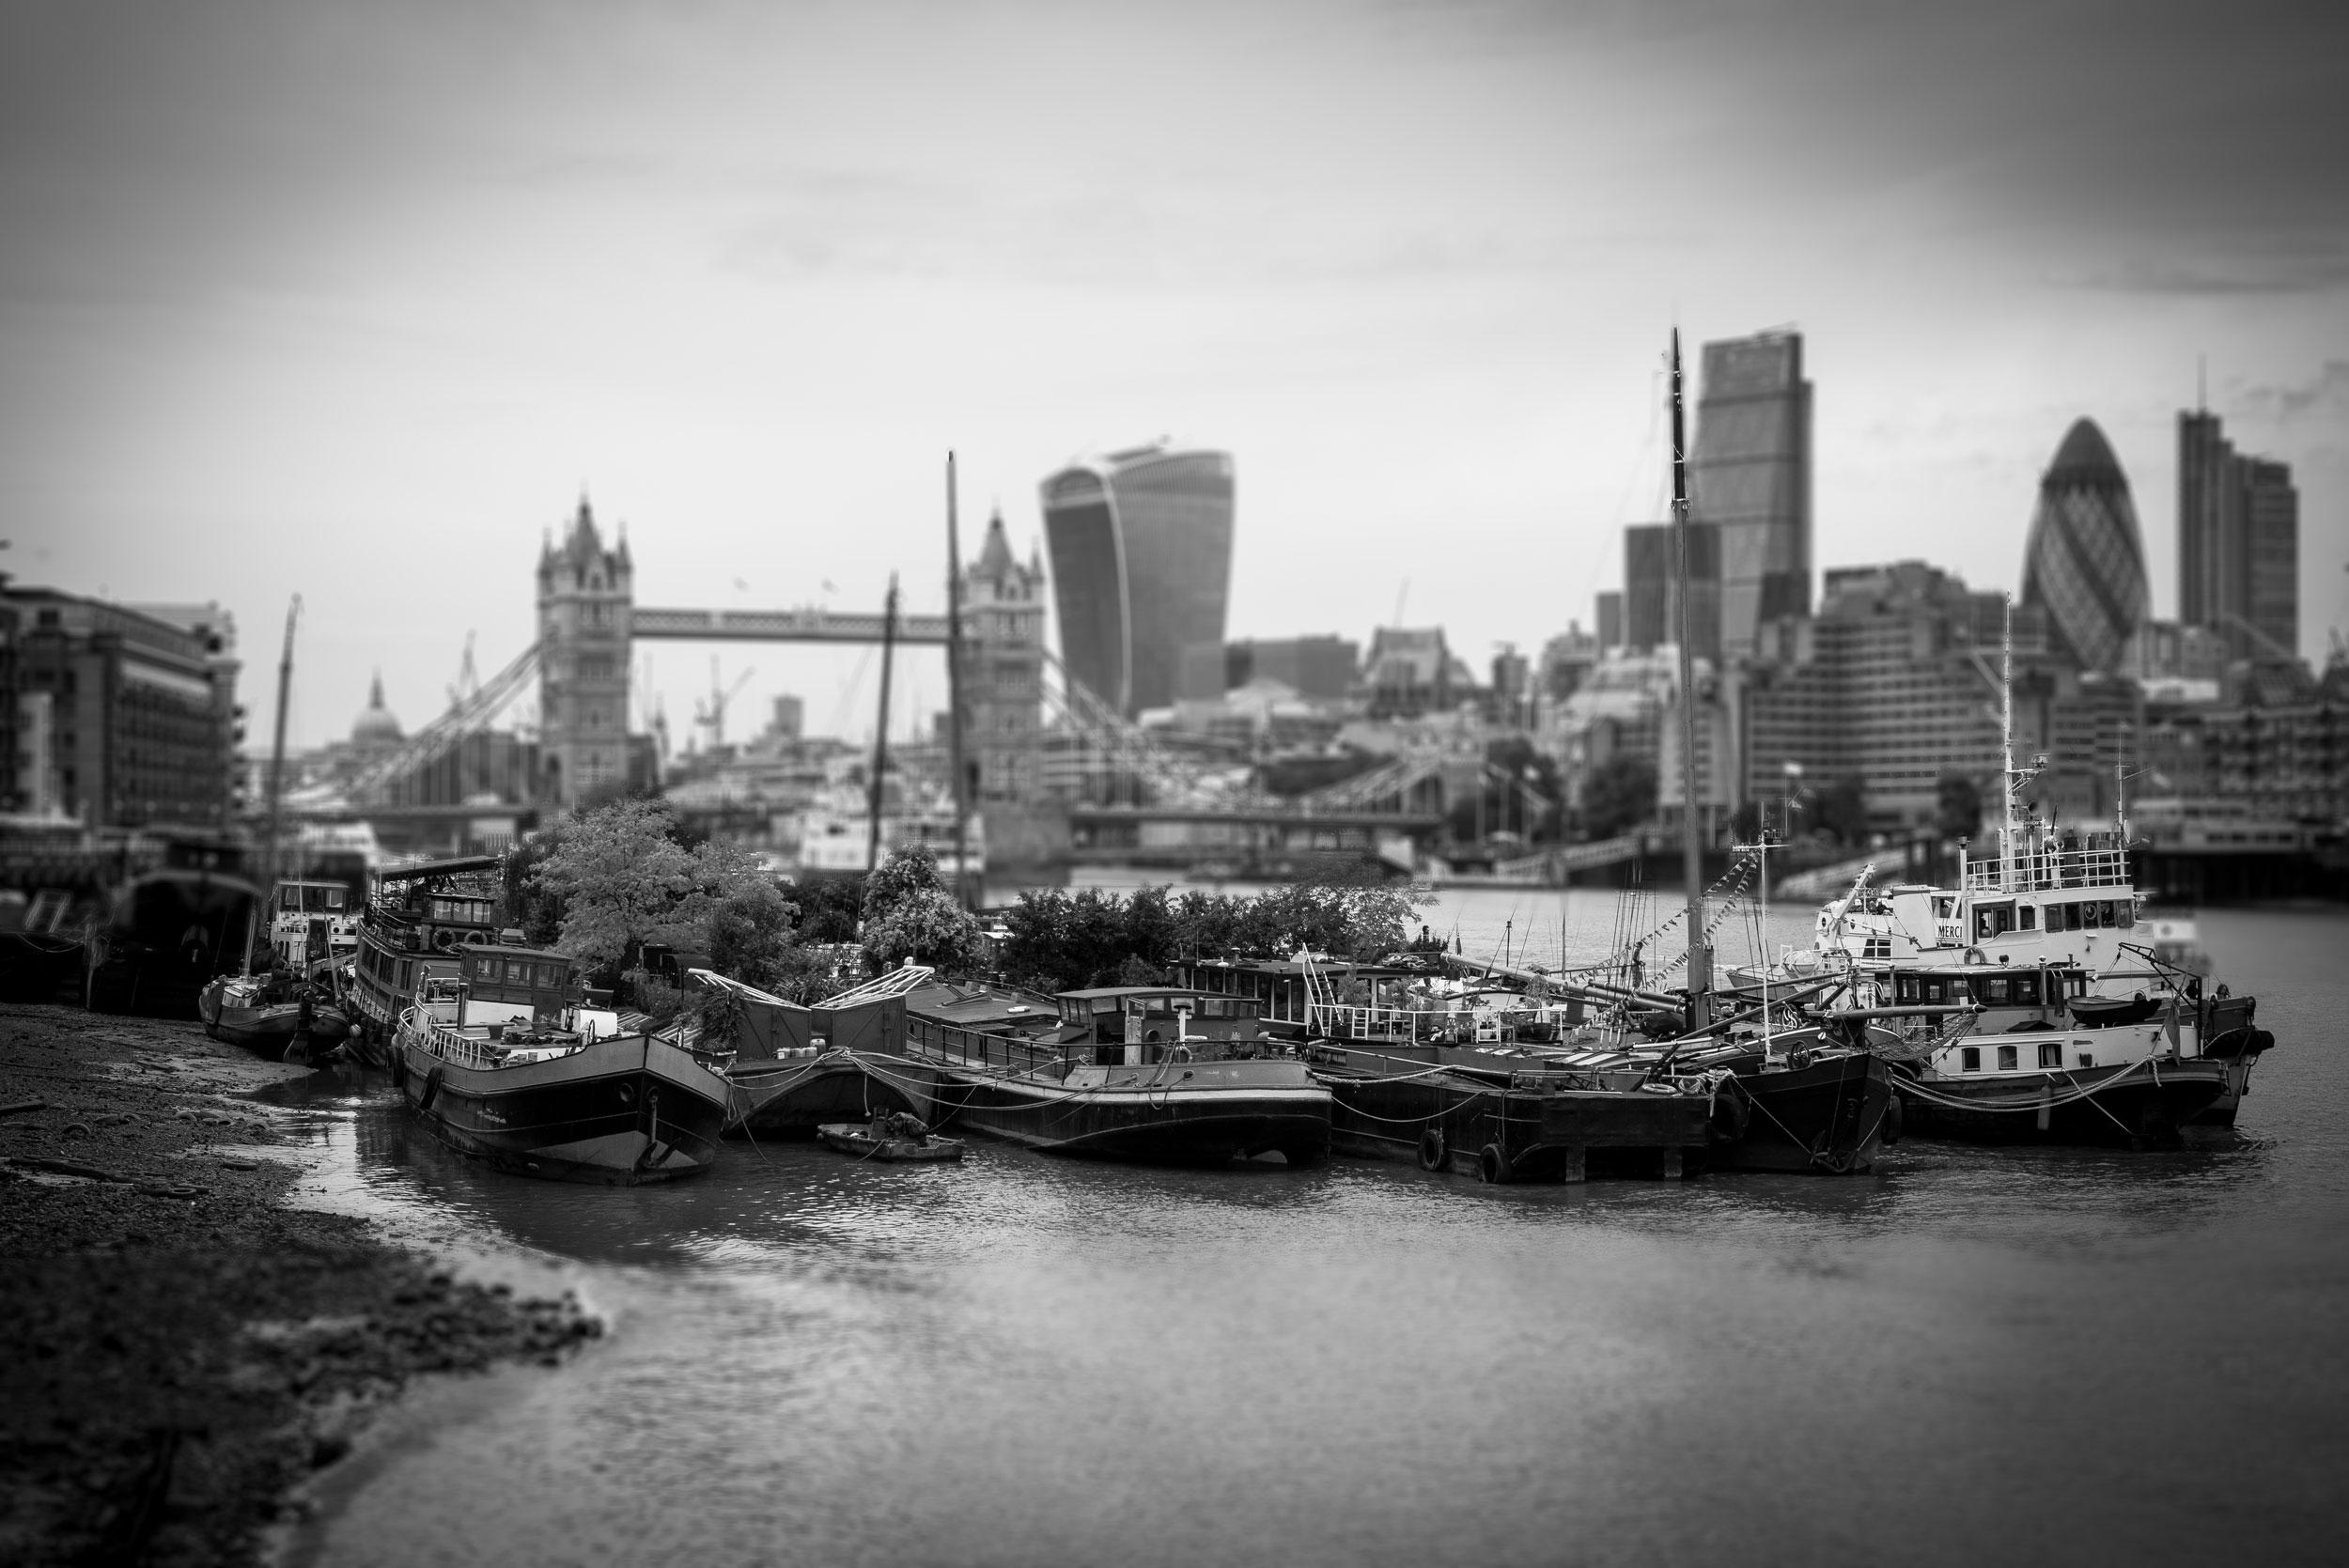 River_Thames_Boats_Sytory_photography.jpg